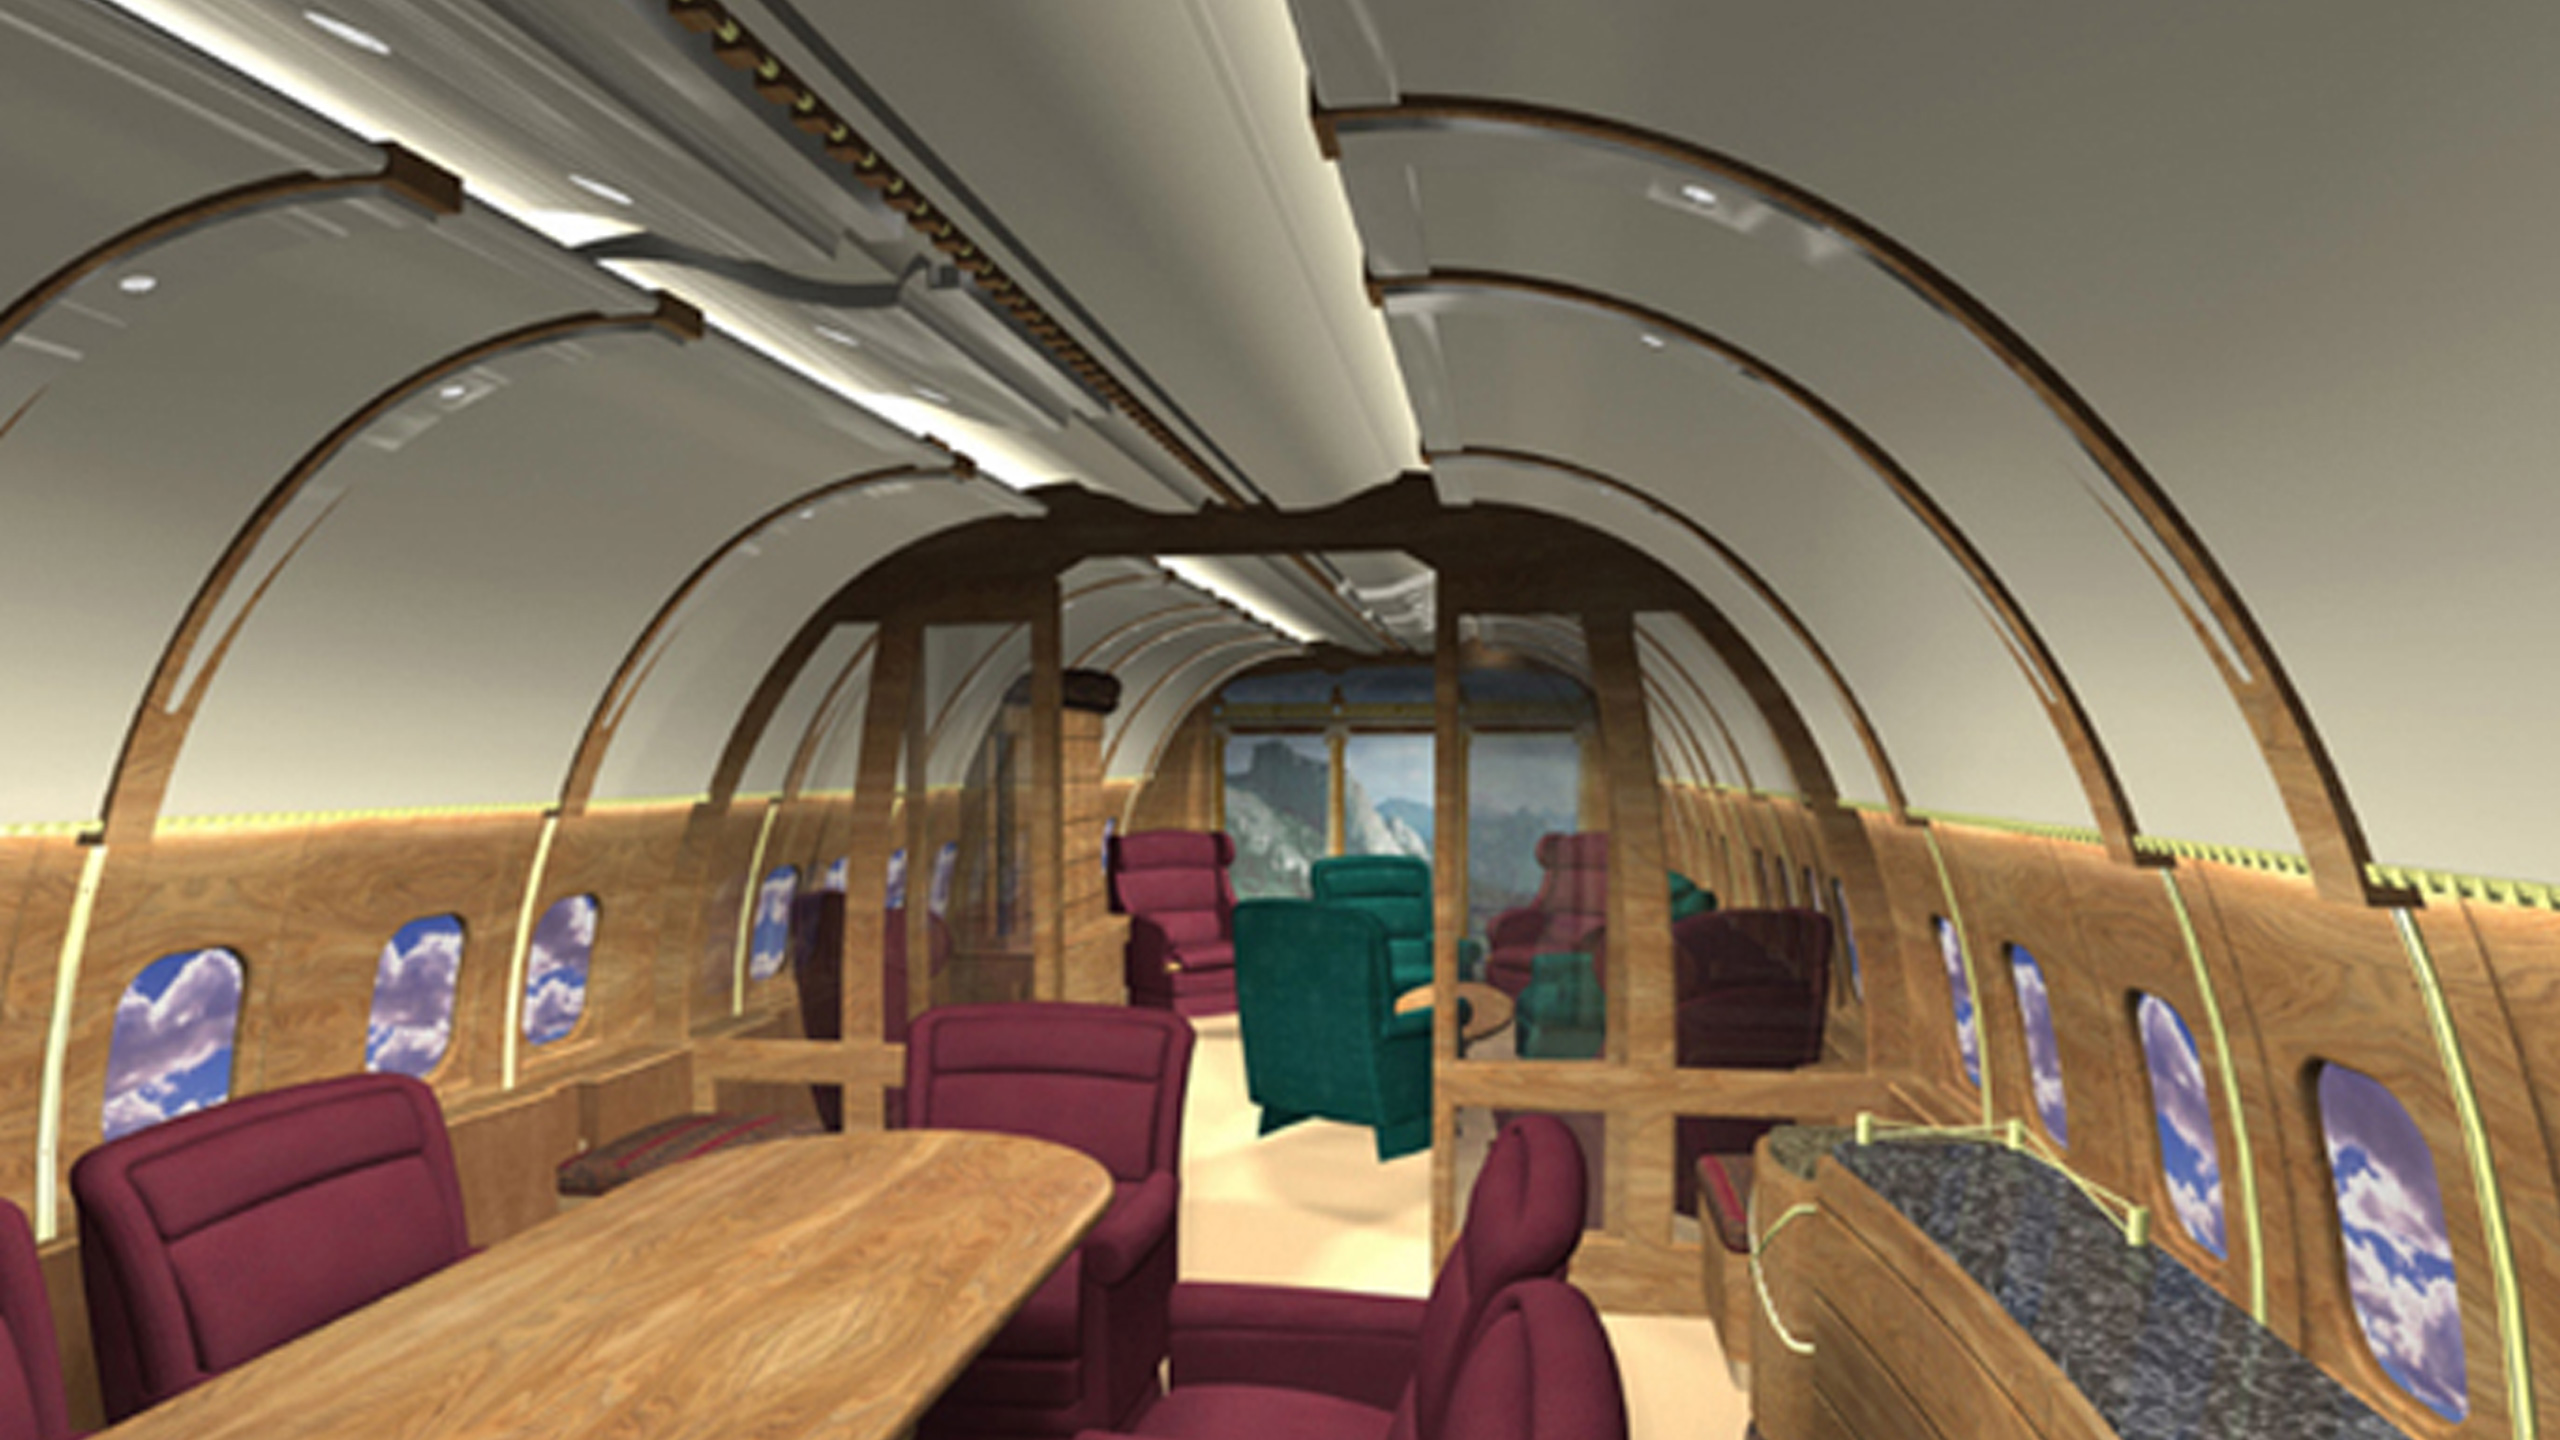 Boeing Business Jet Interiors - Robert Edson Swain ...